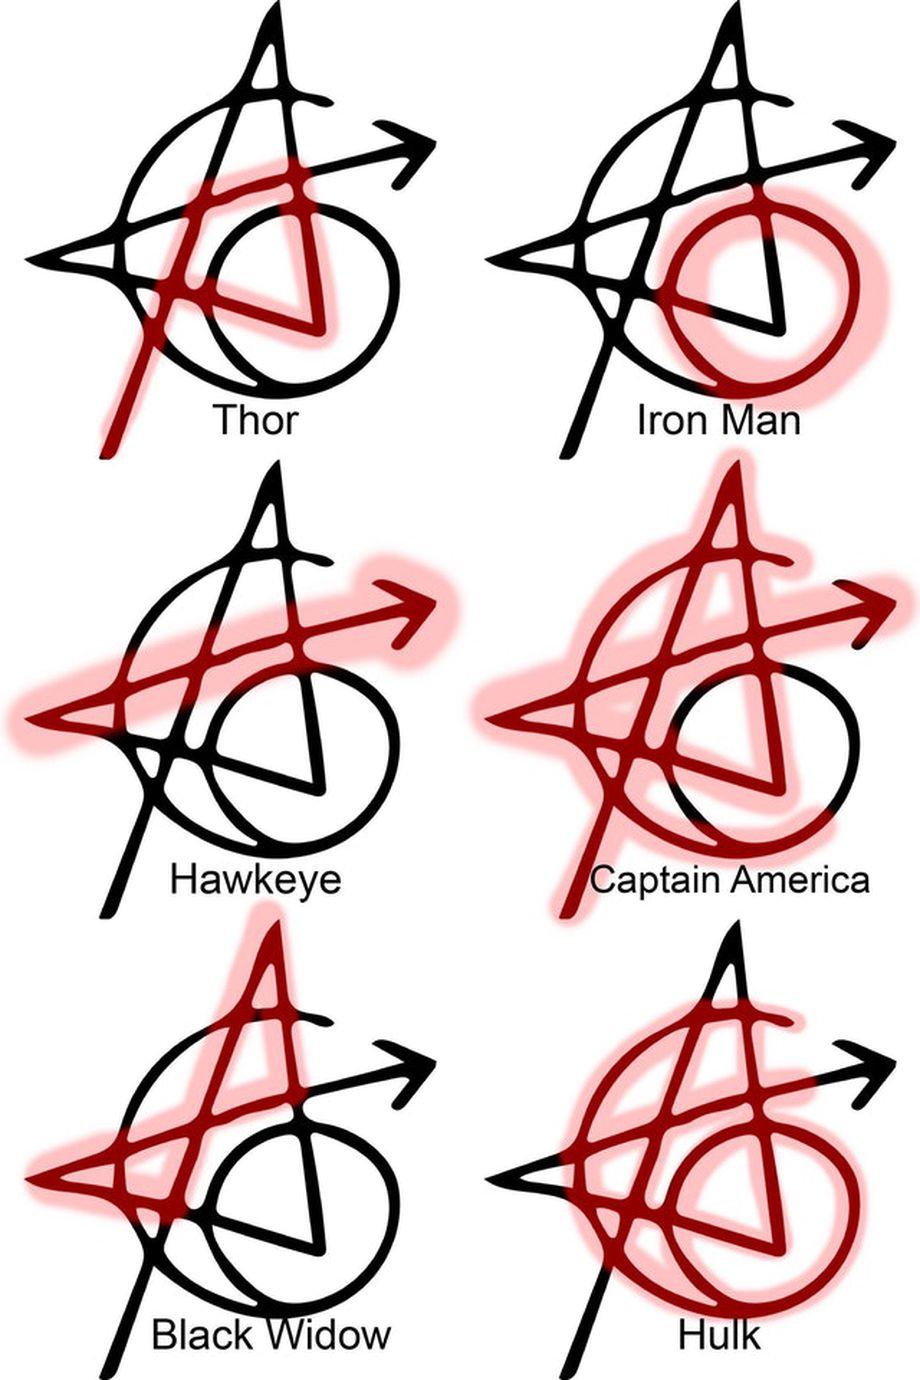 Qué Significa El Tatuaje De Los Vengadores Originales